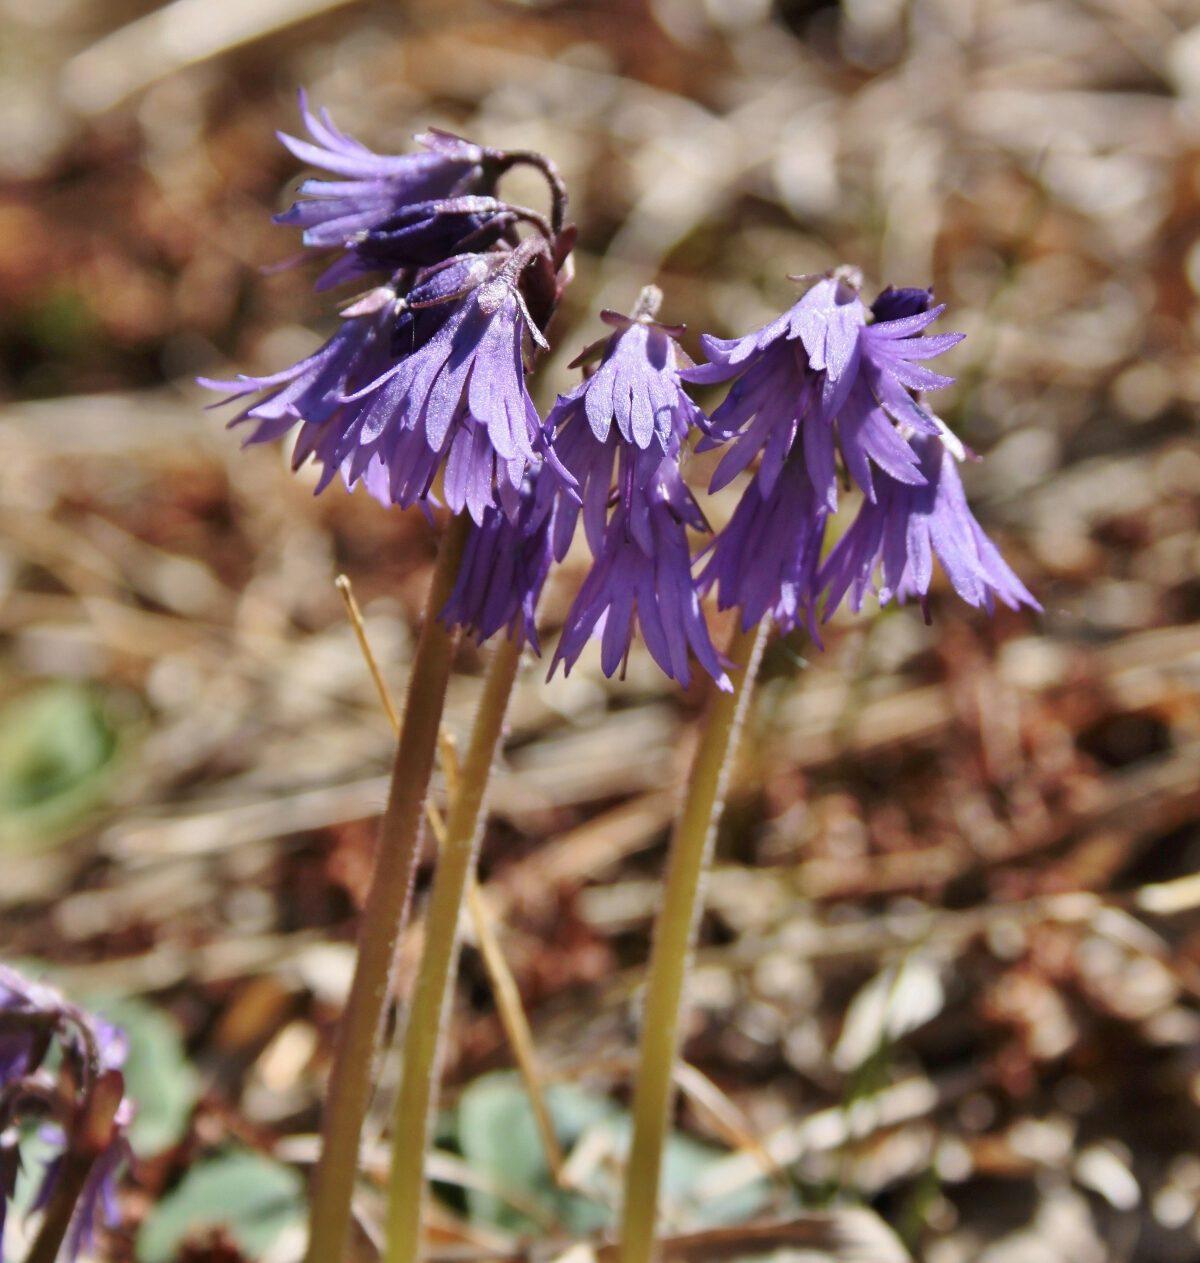 Blüten des Alpen-Glöckchens